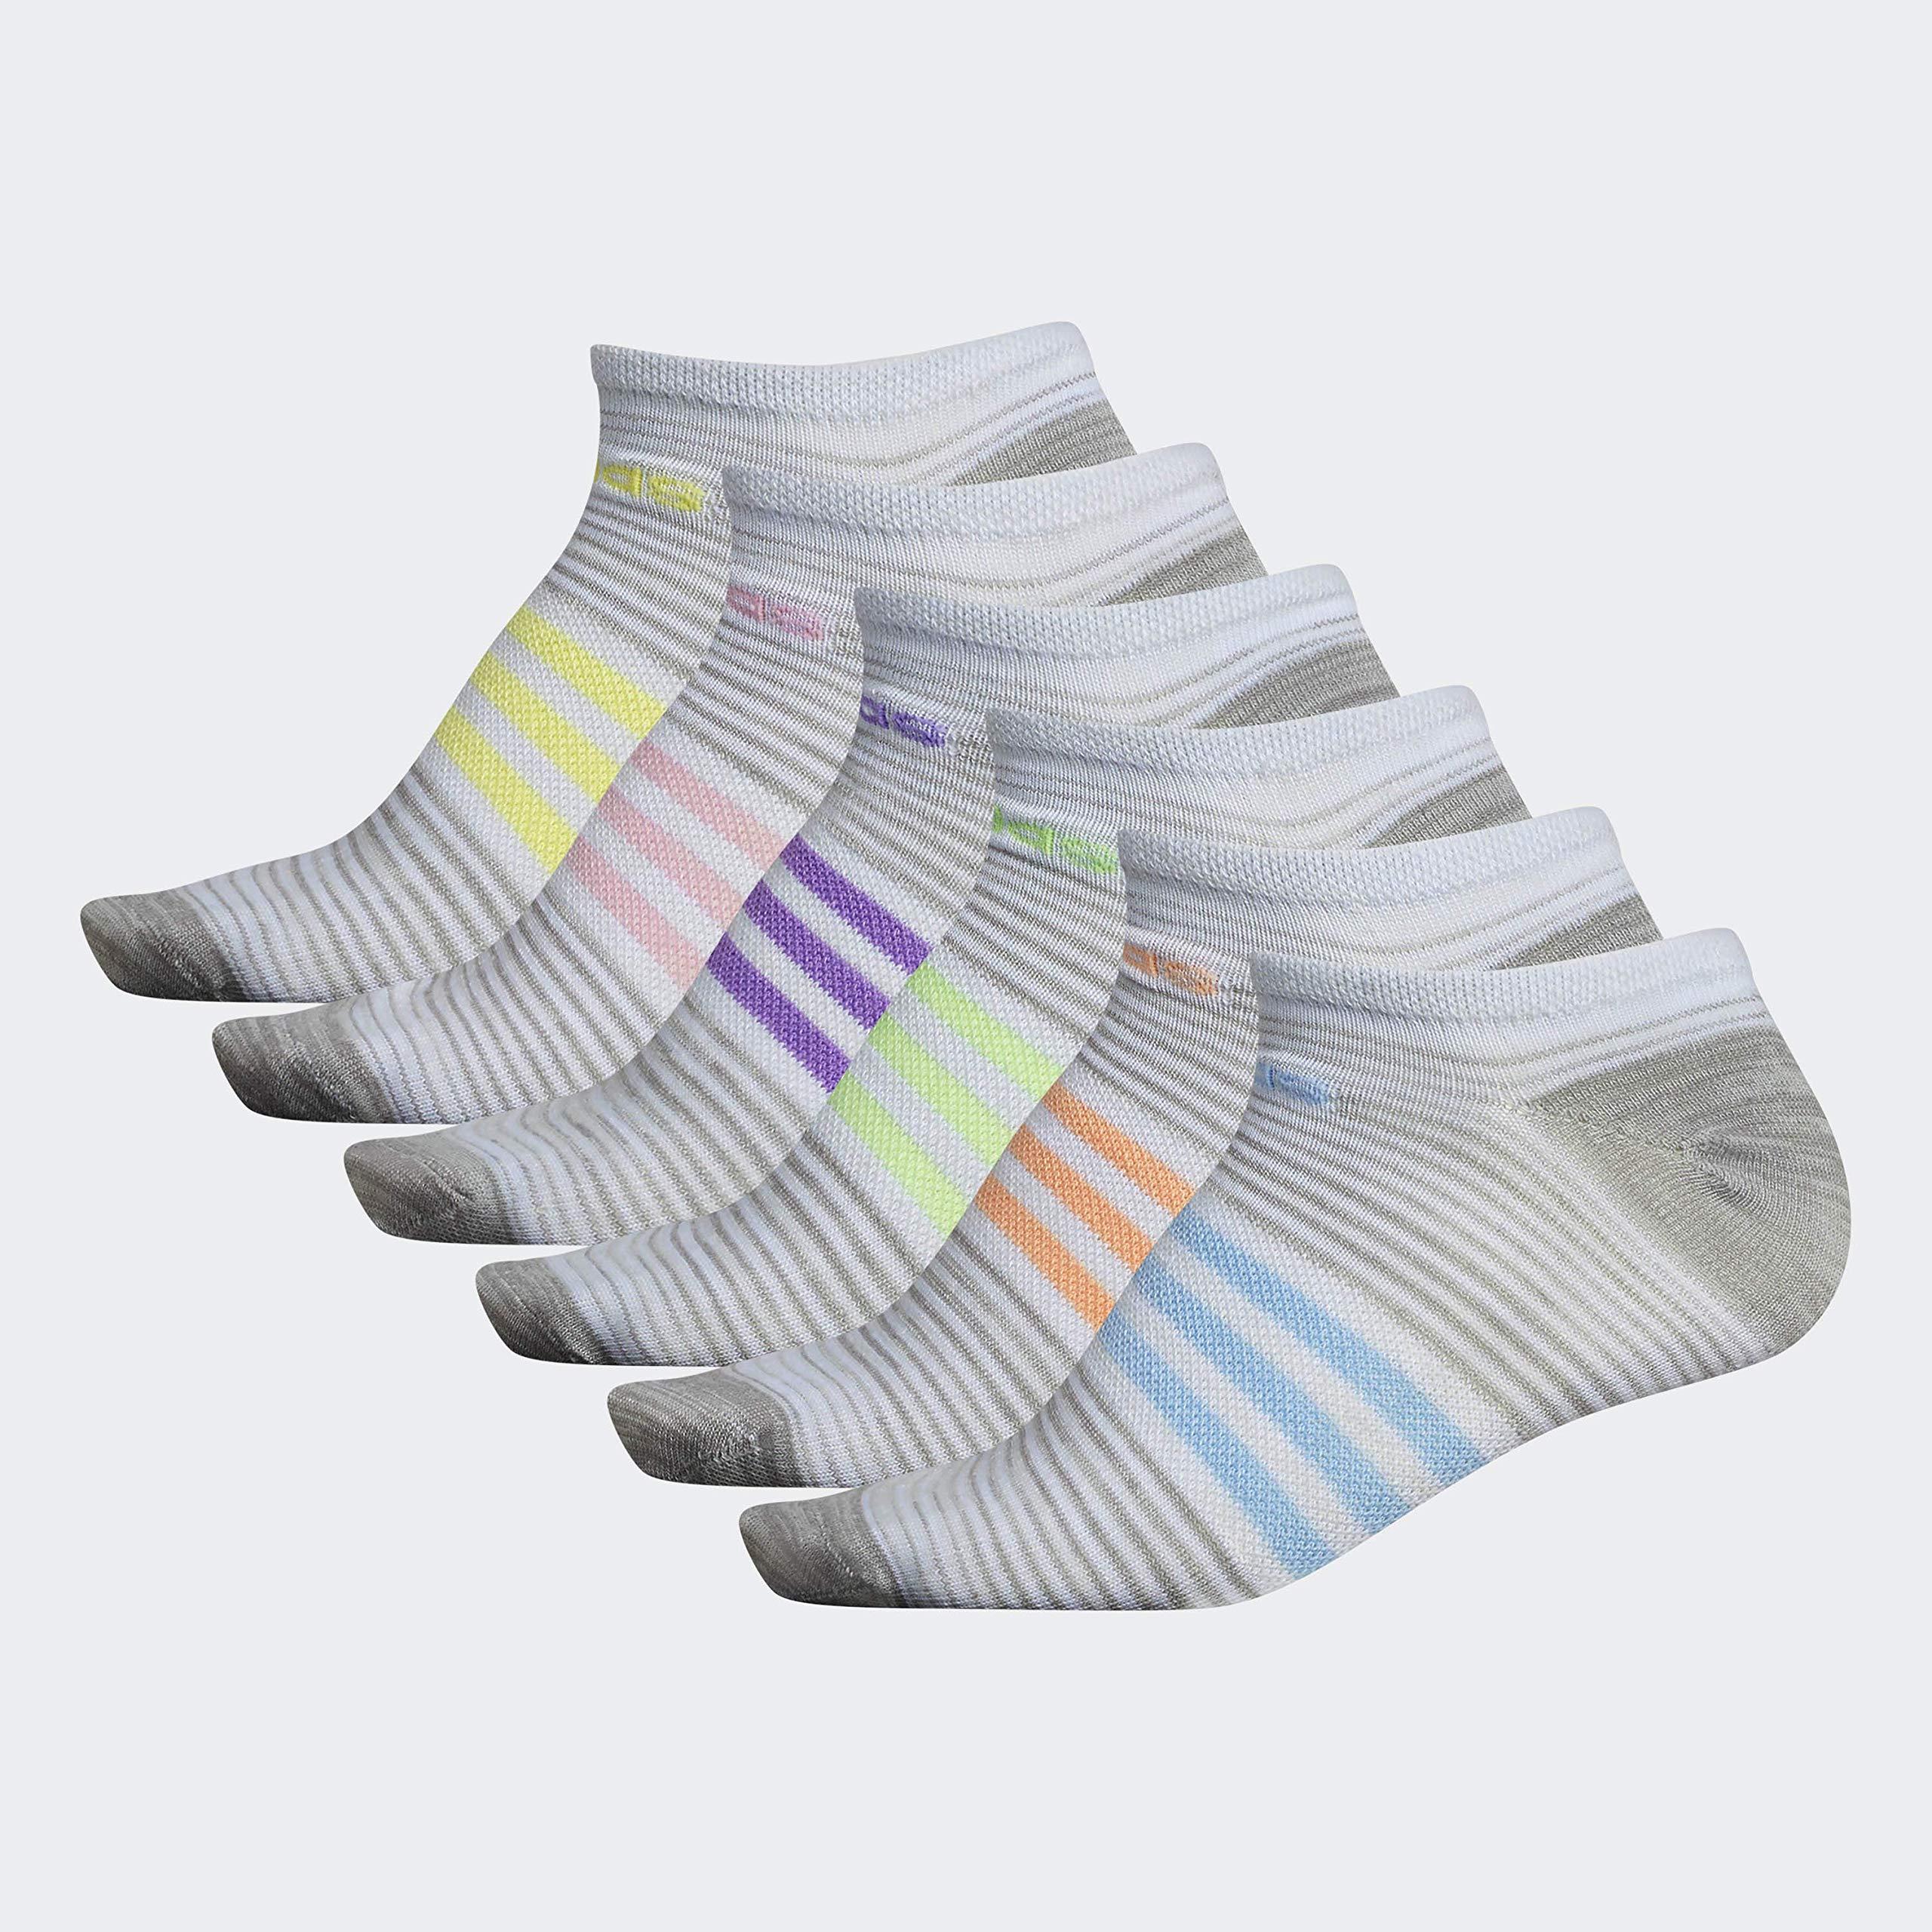 adidas Women's Superlite No Show Socks (6-Pair), Clear Grey - Light Onix Freerun/White - Clear Grey Fre, Medium, (Shoe Size 5-10) by adidas